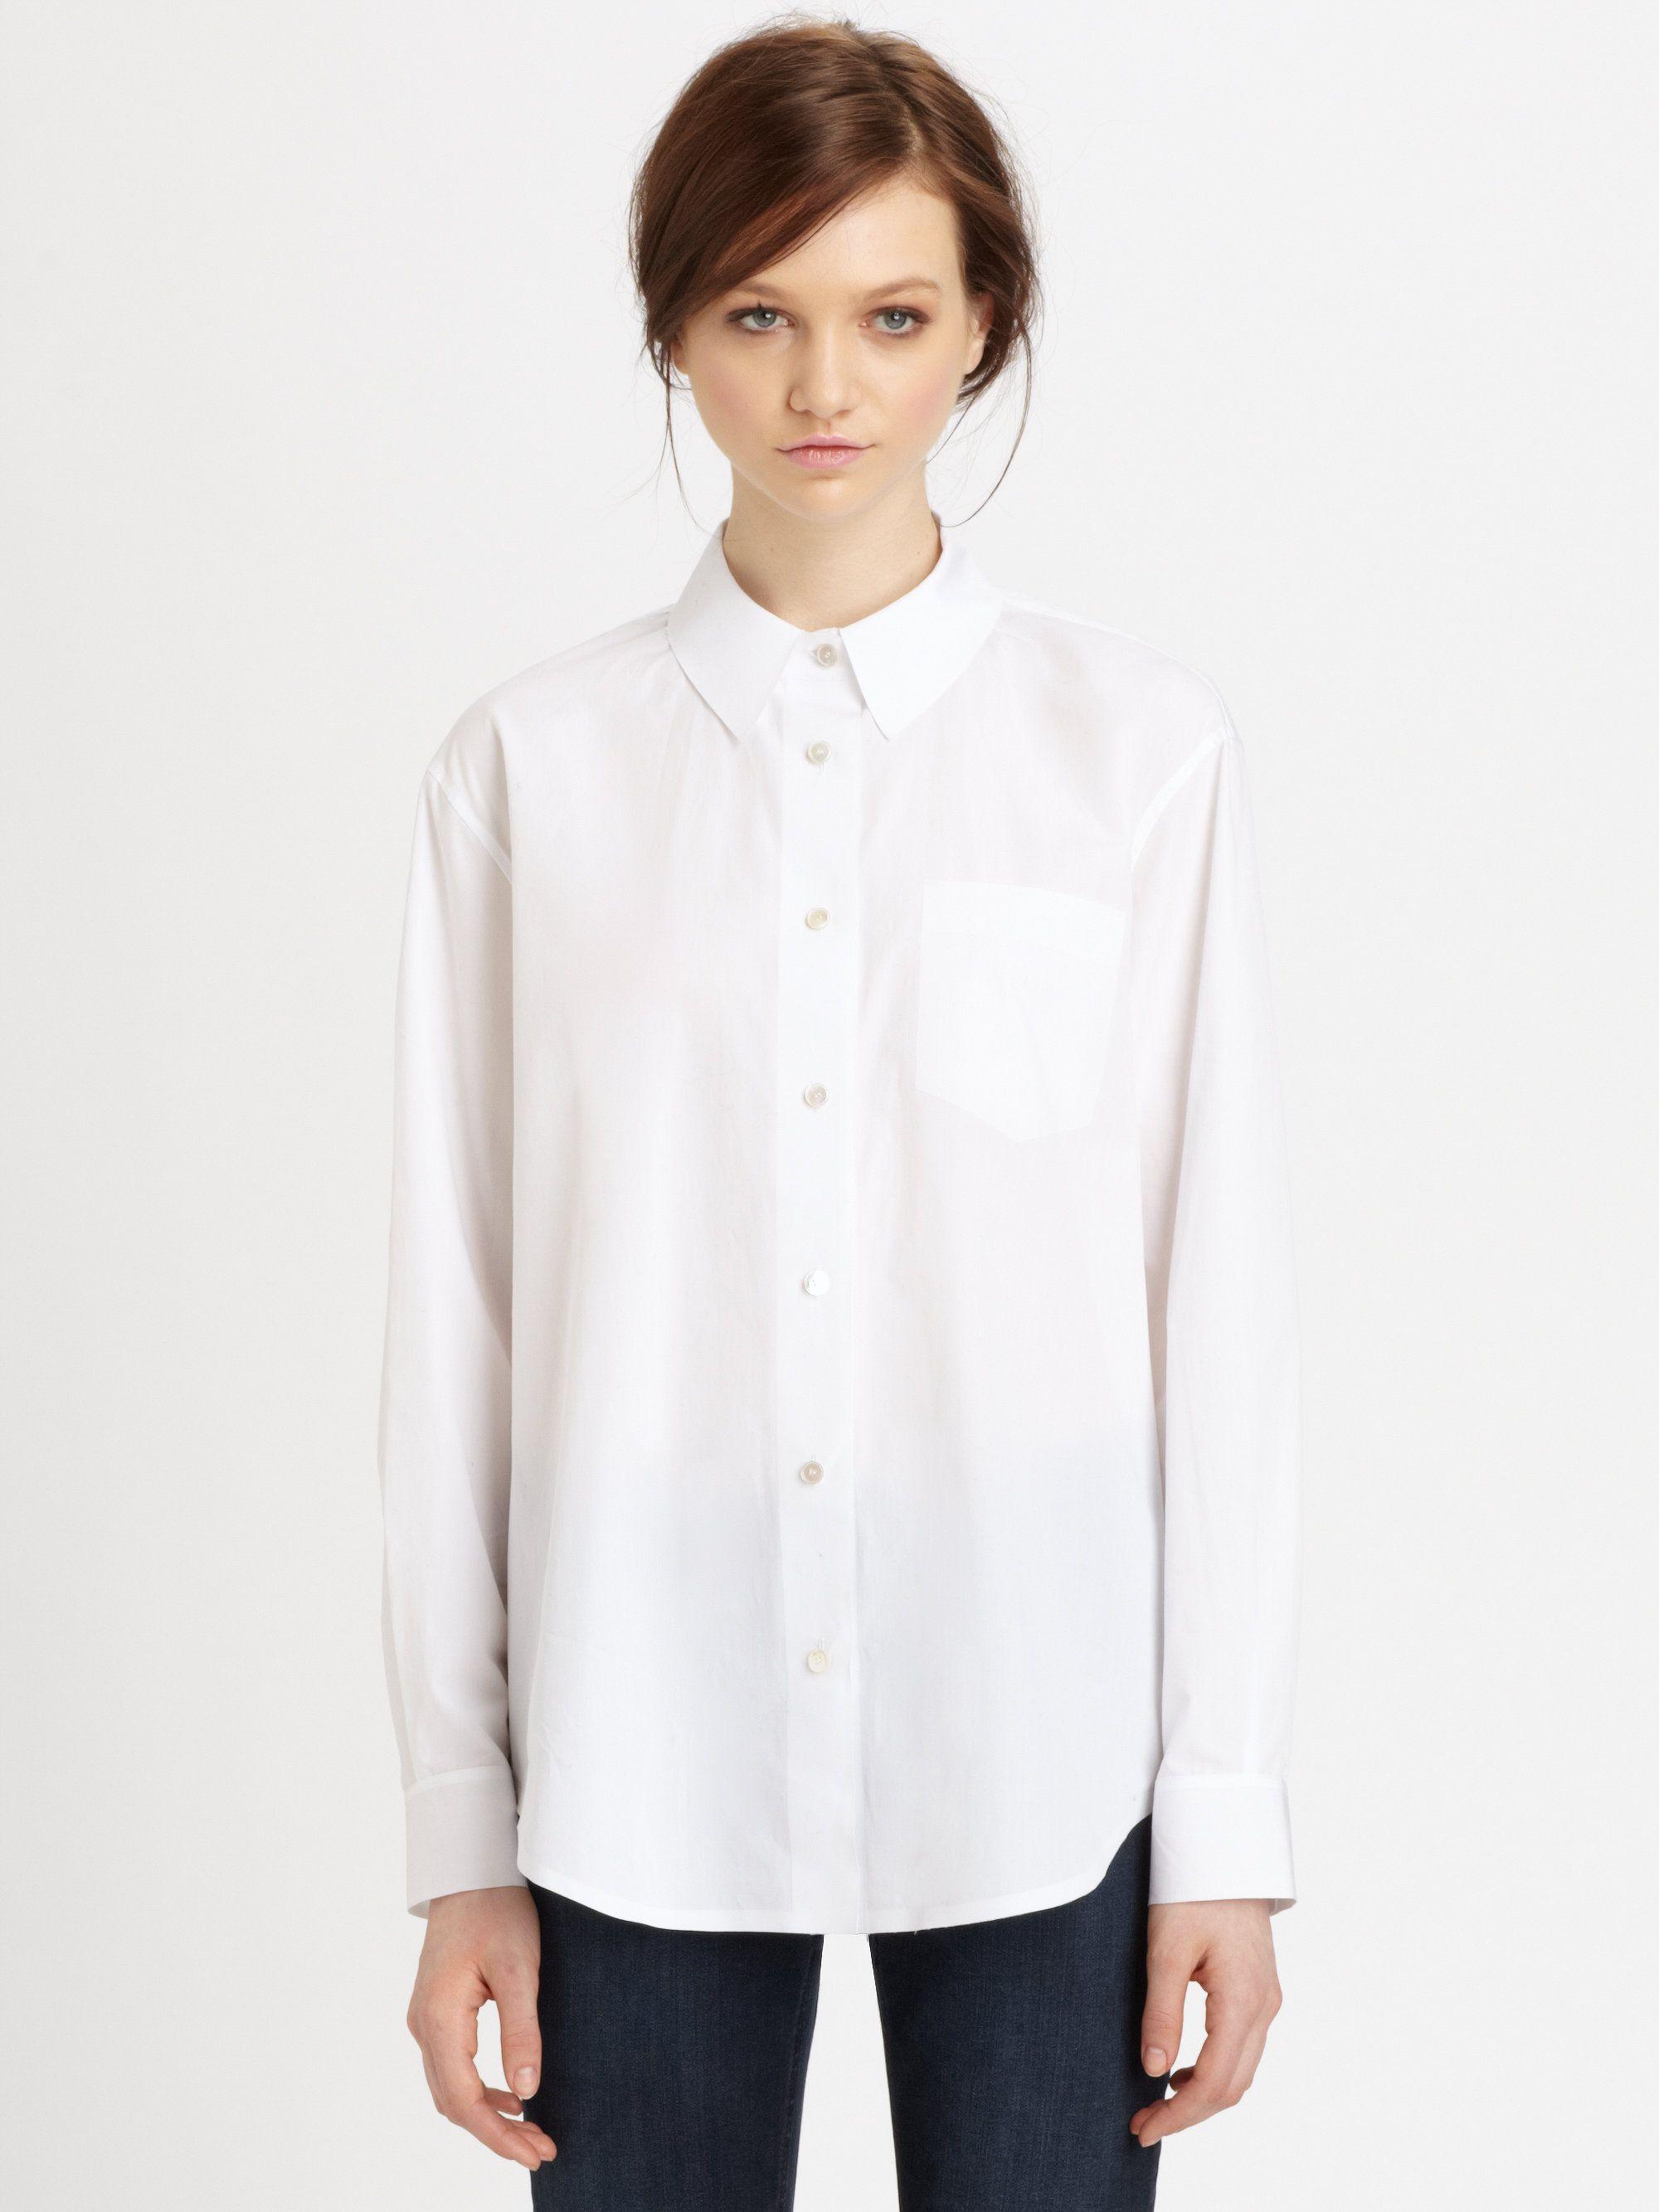 Acne white shirt fashion pinterest white shirts and fashion